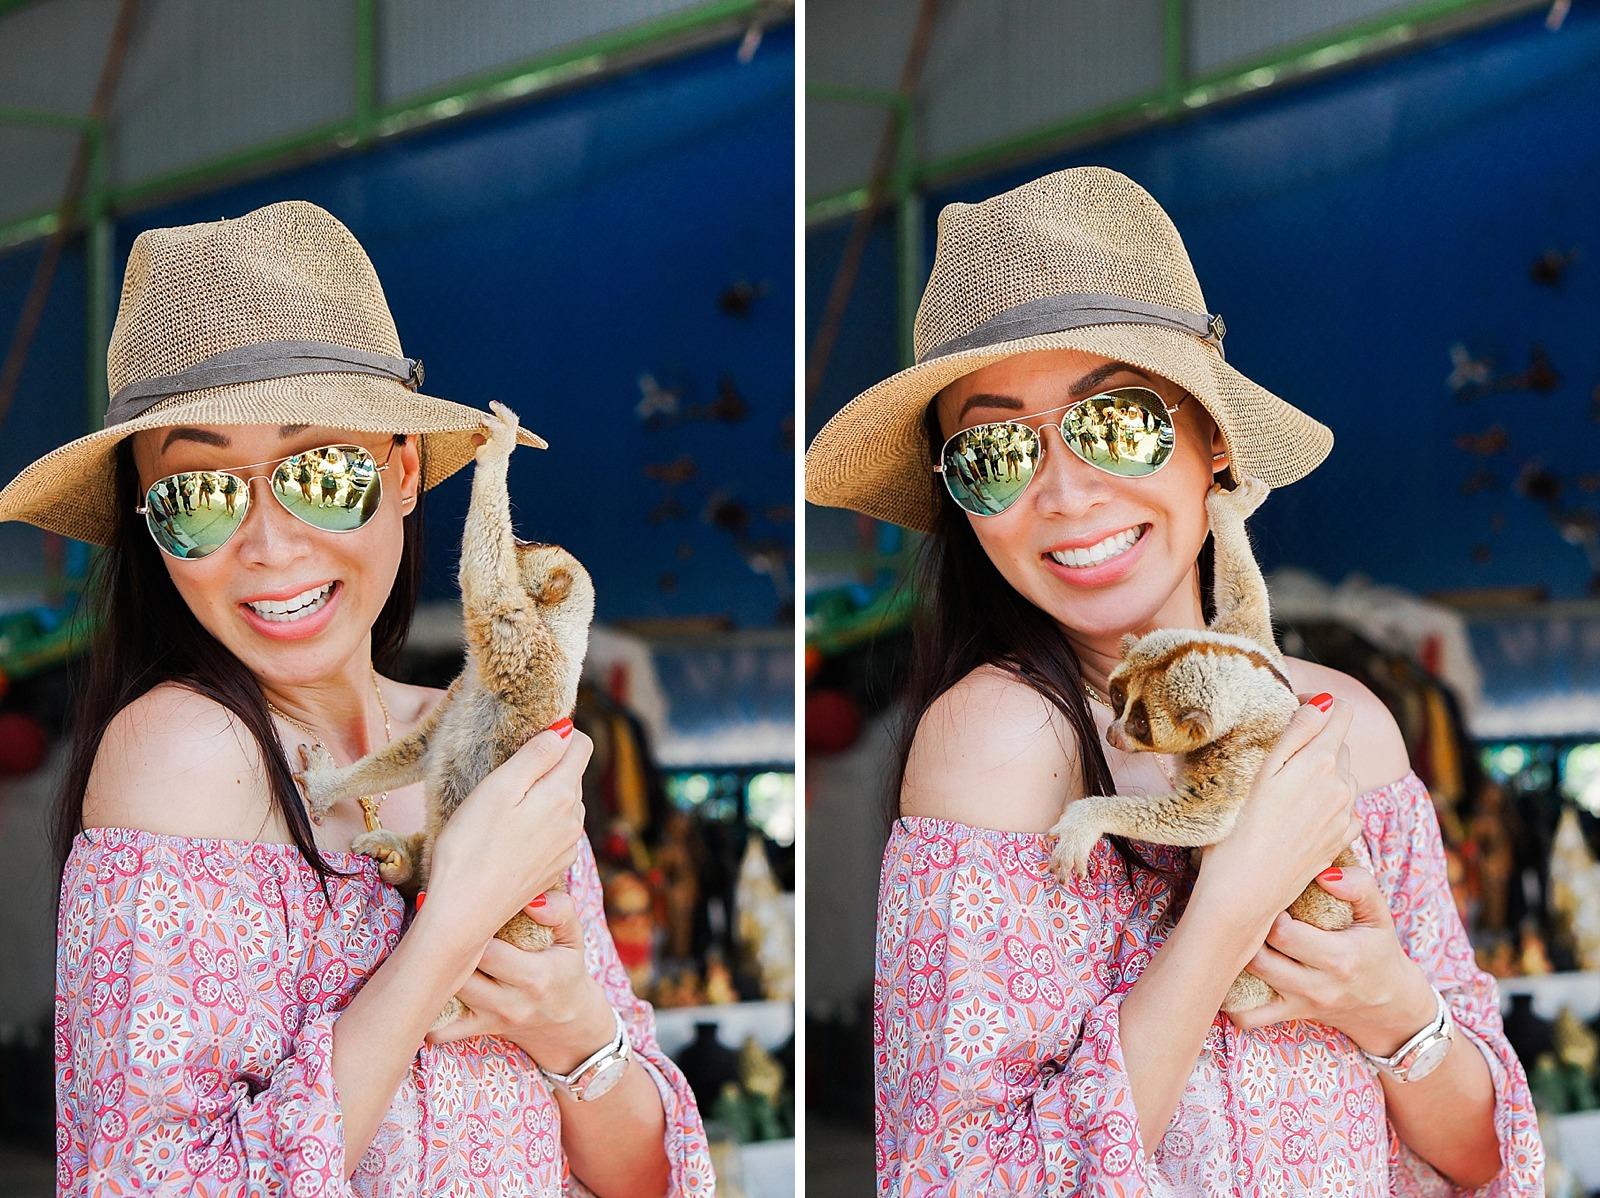 Thailand-diana-elizabeth-travel-blogger-phoenix-230